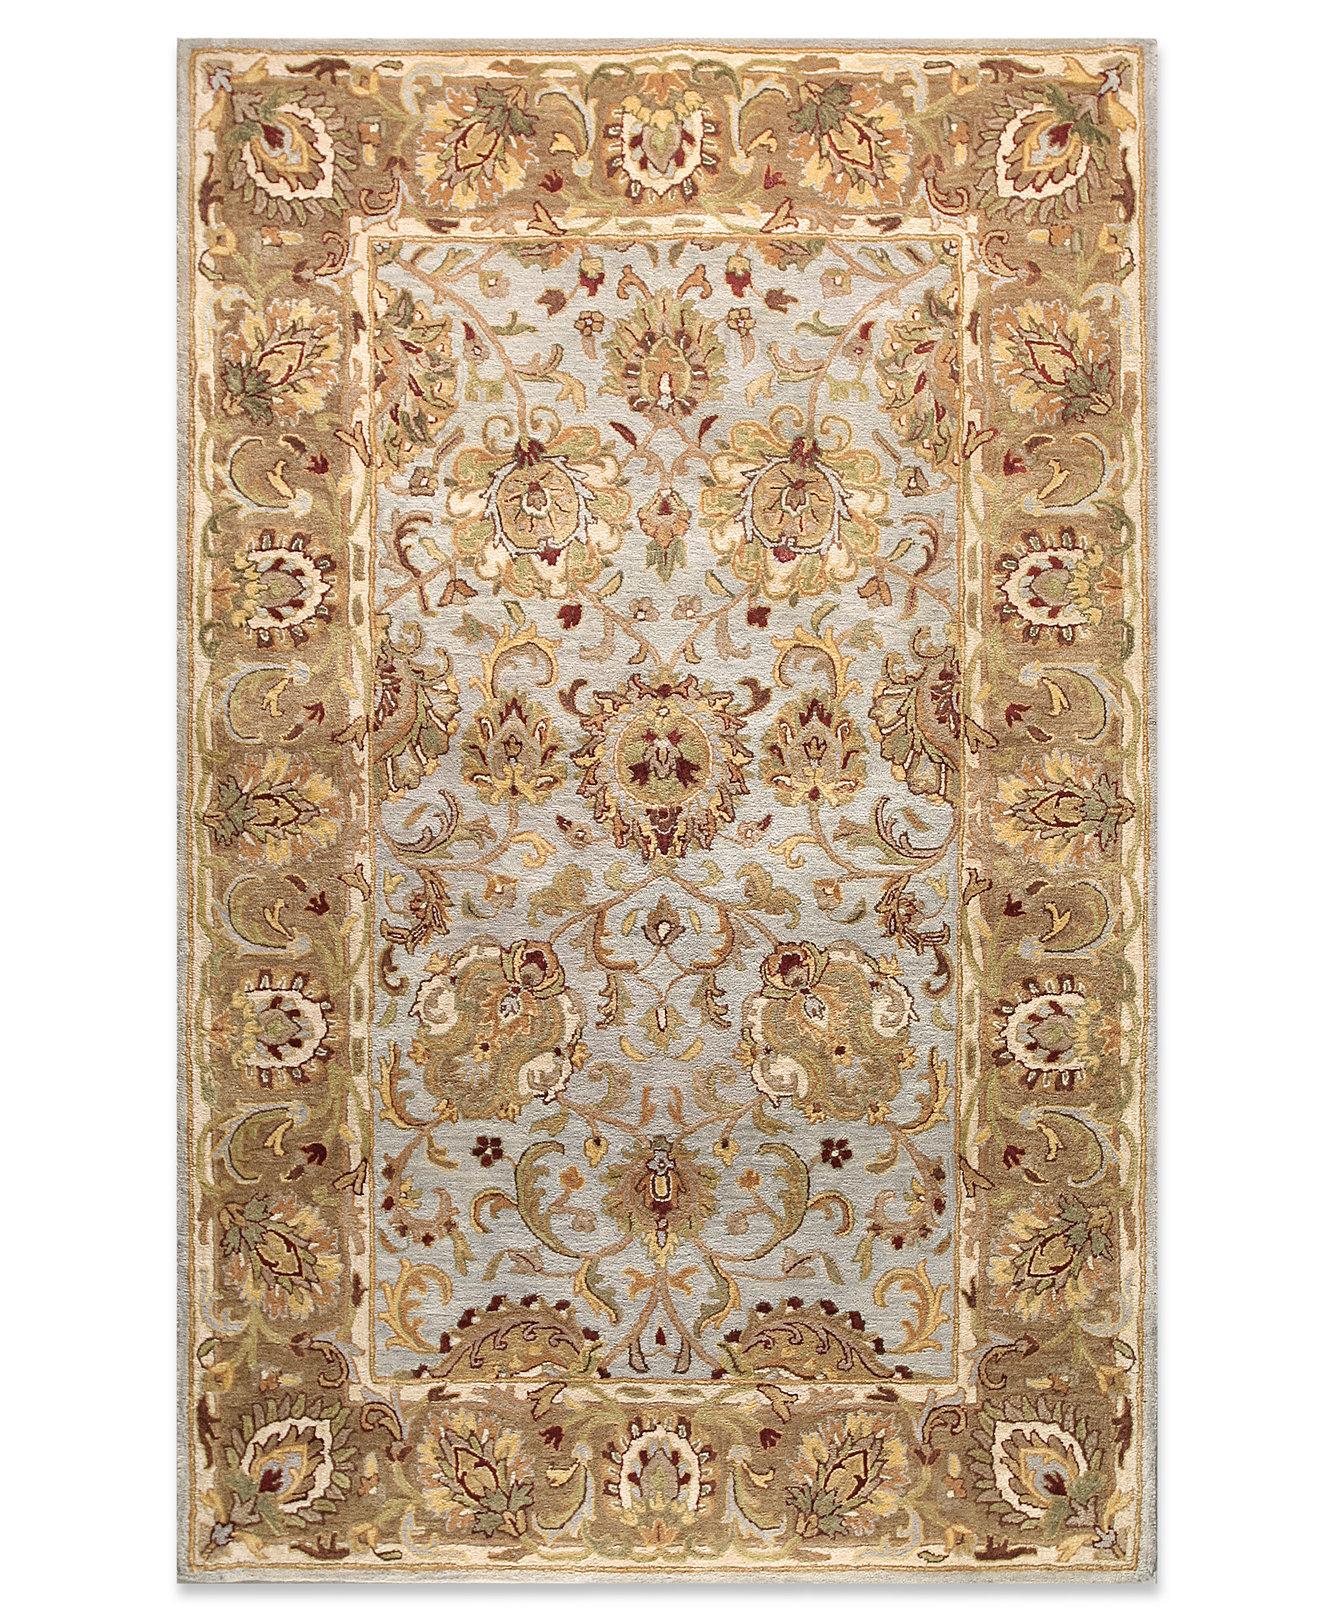 bashian brothers rugs  macy's - bashian area rug wilshire hg light blue '